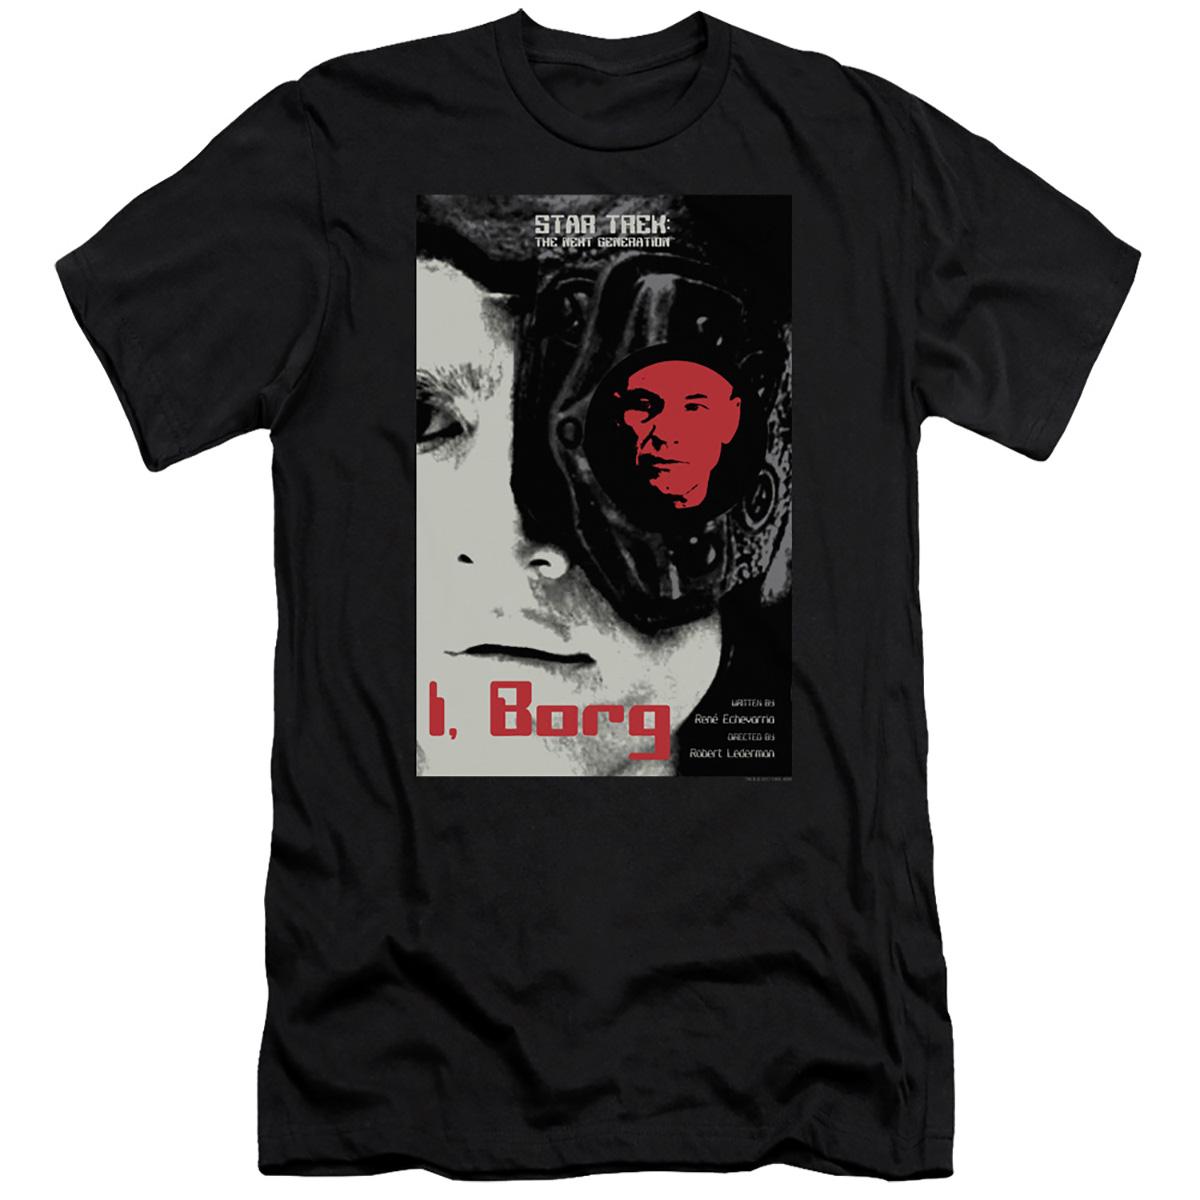 Star Trek The Next Generation I, Borg T-Shirt